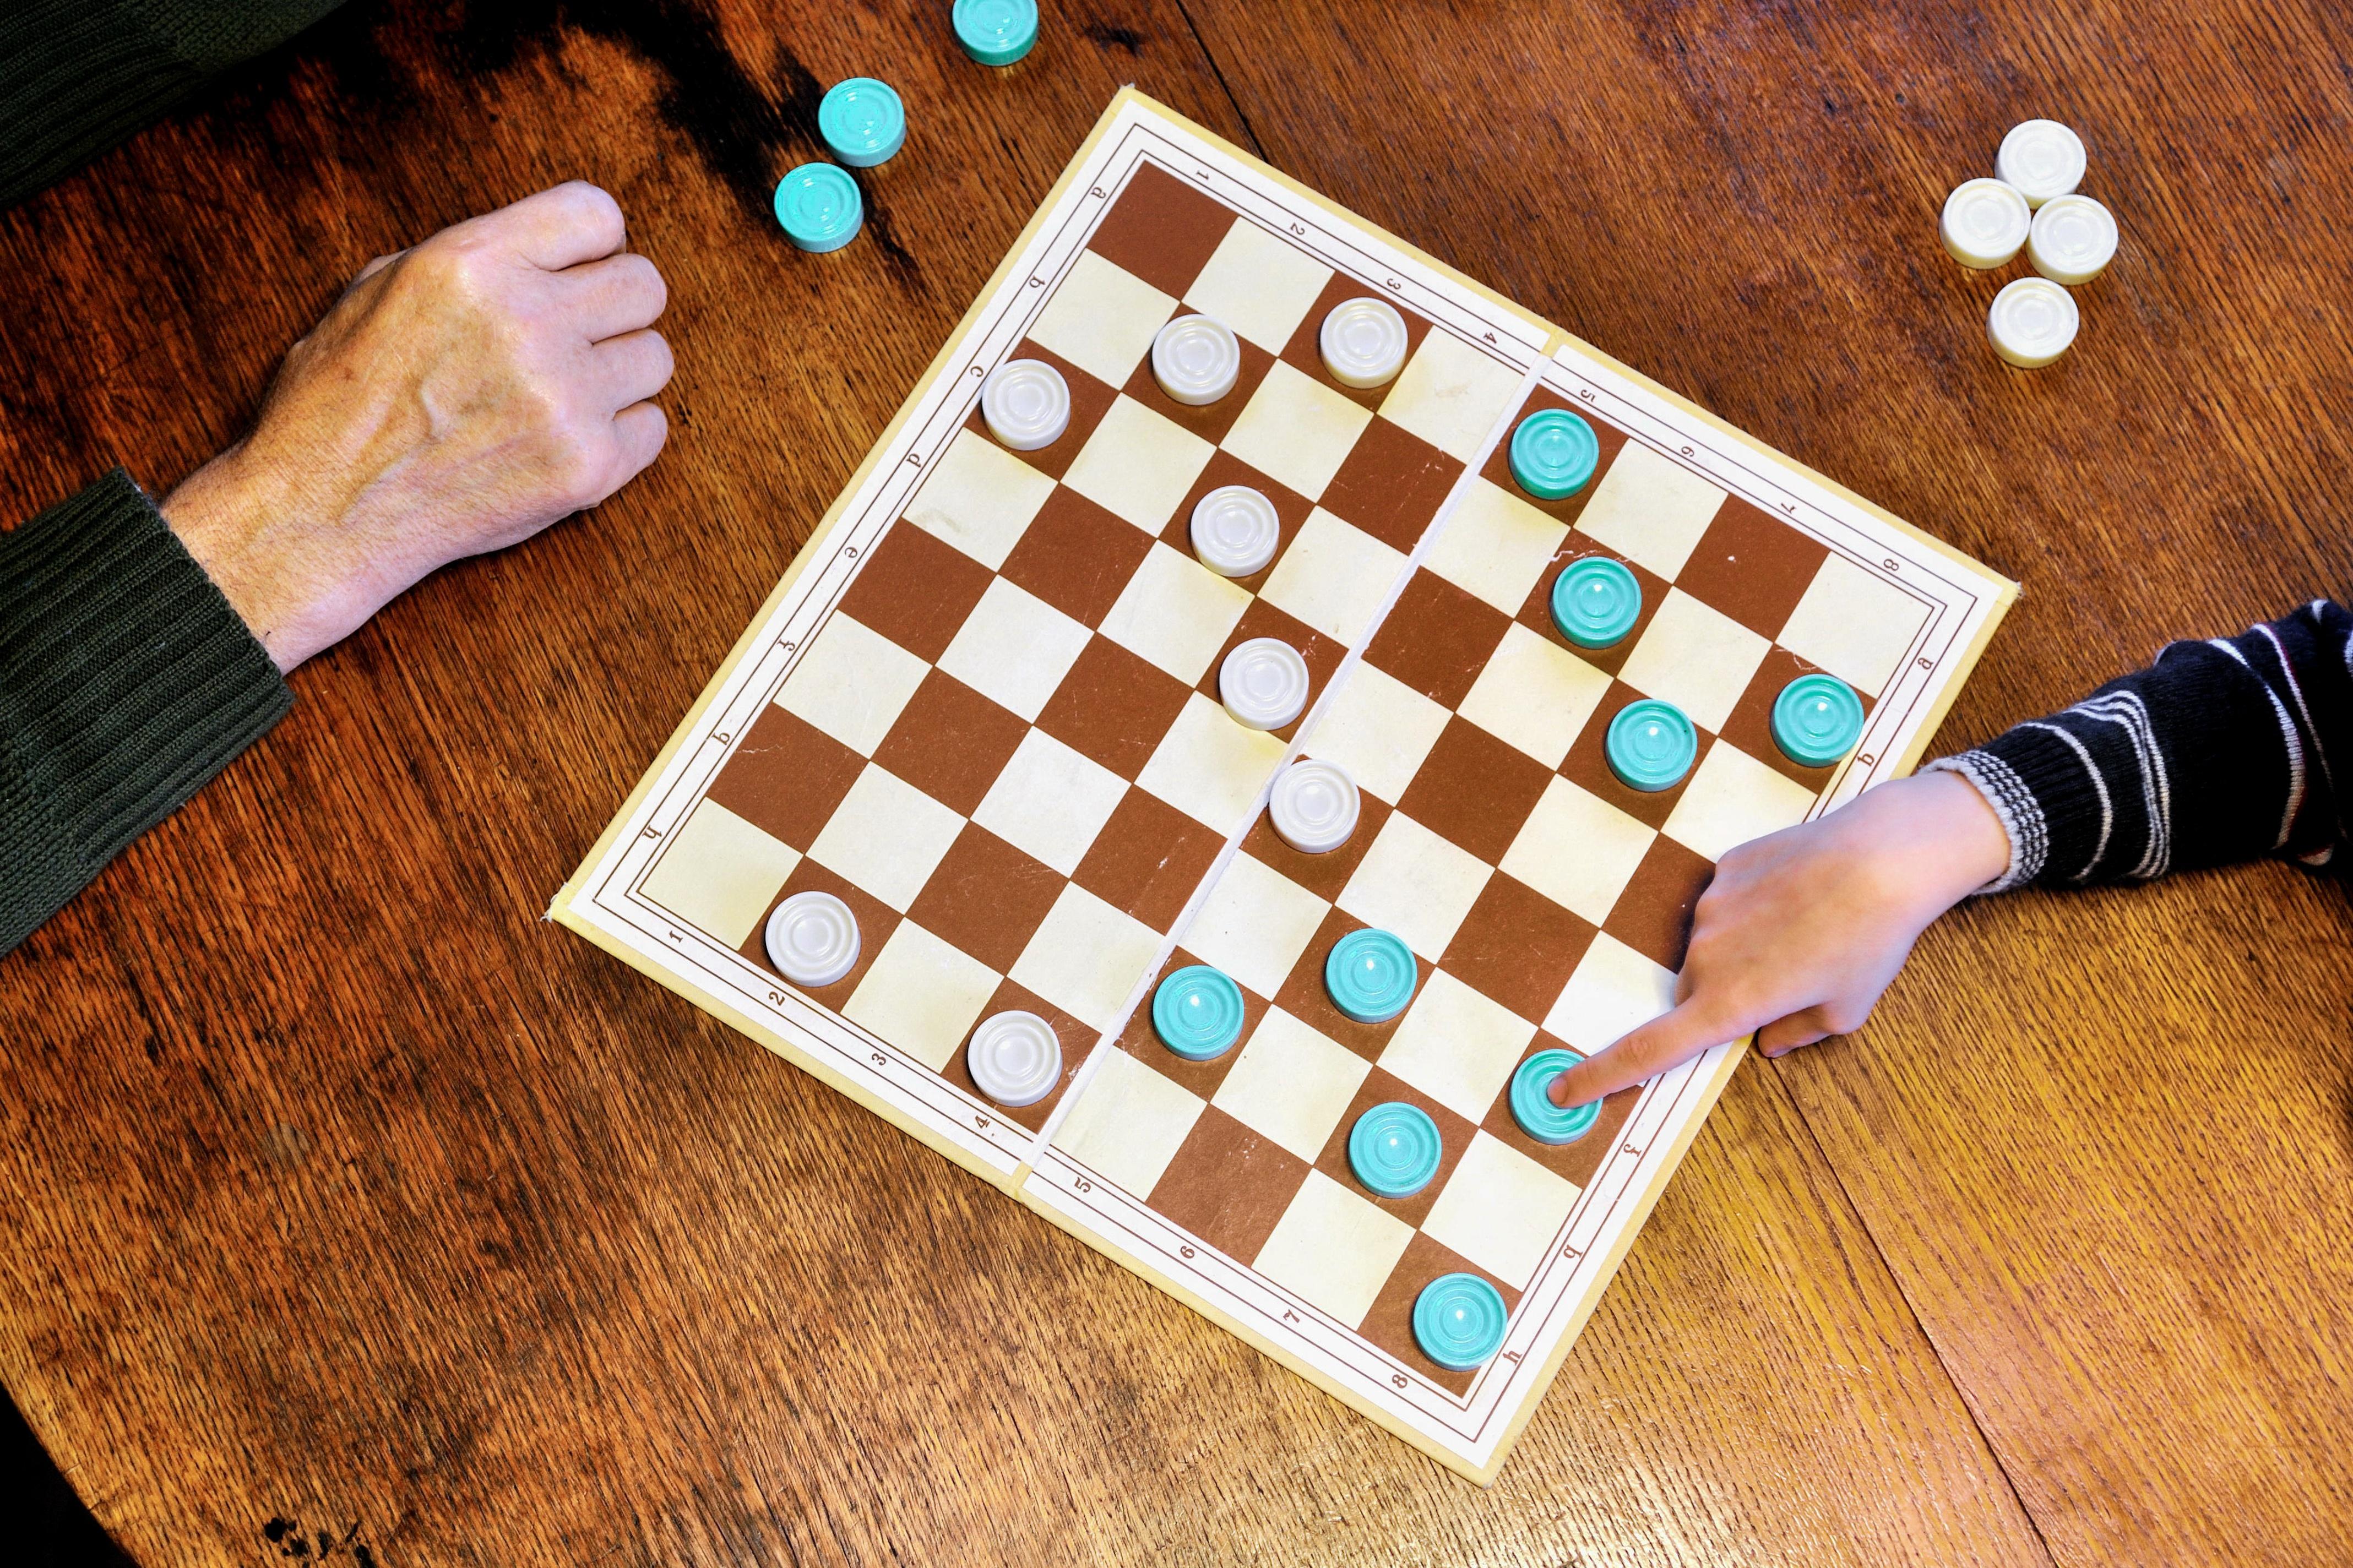 checkers game.jpg